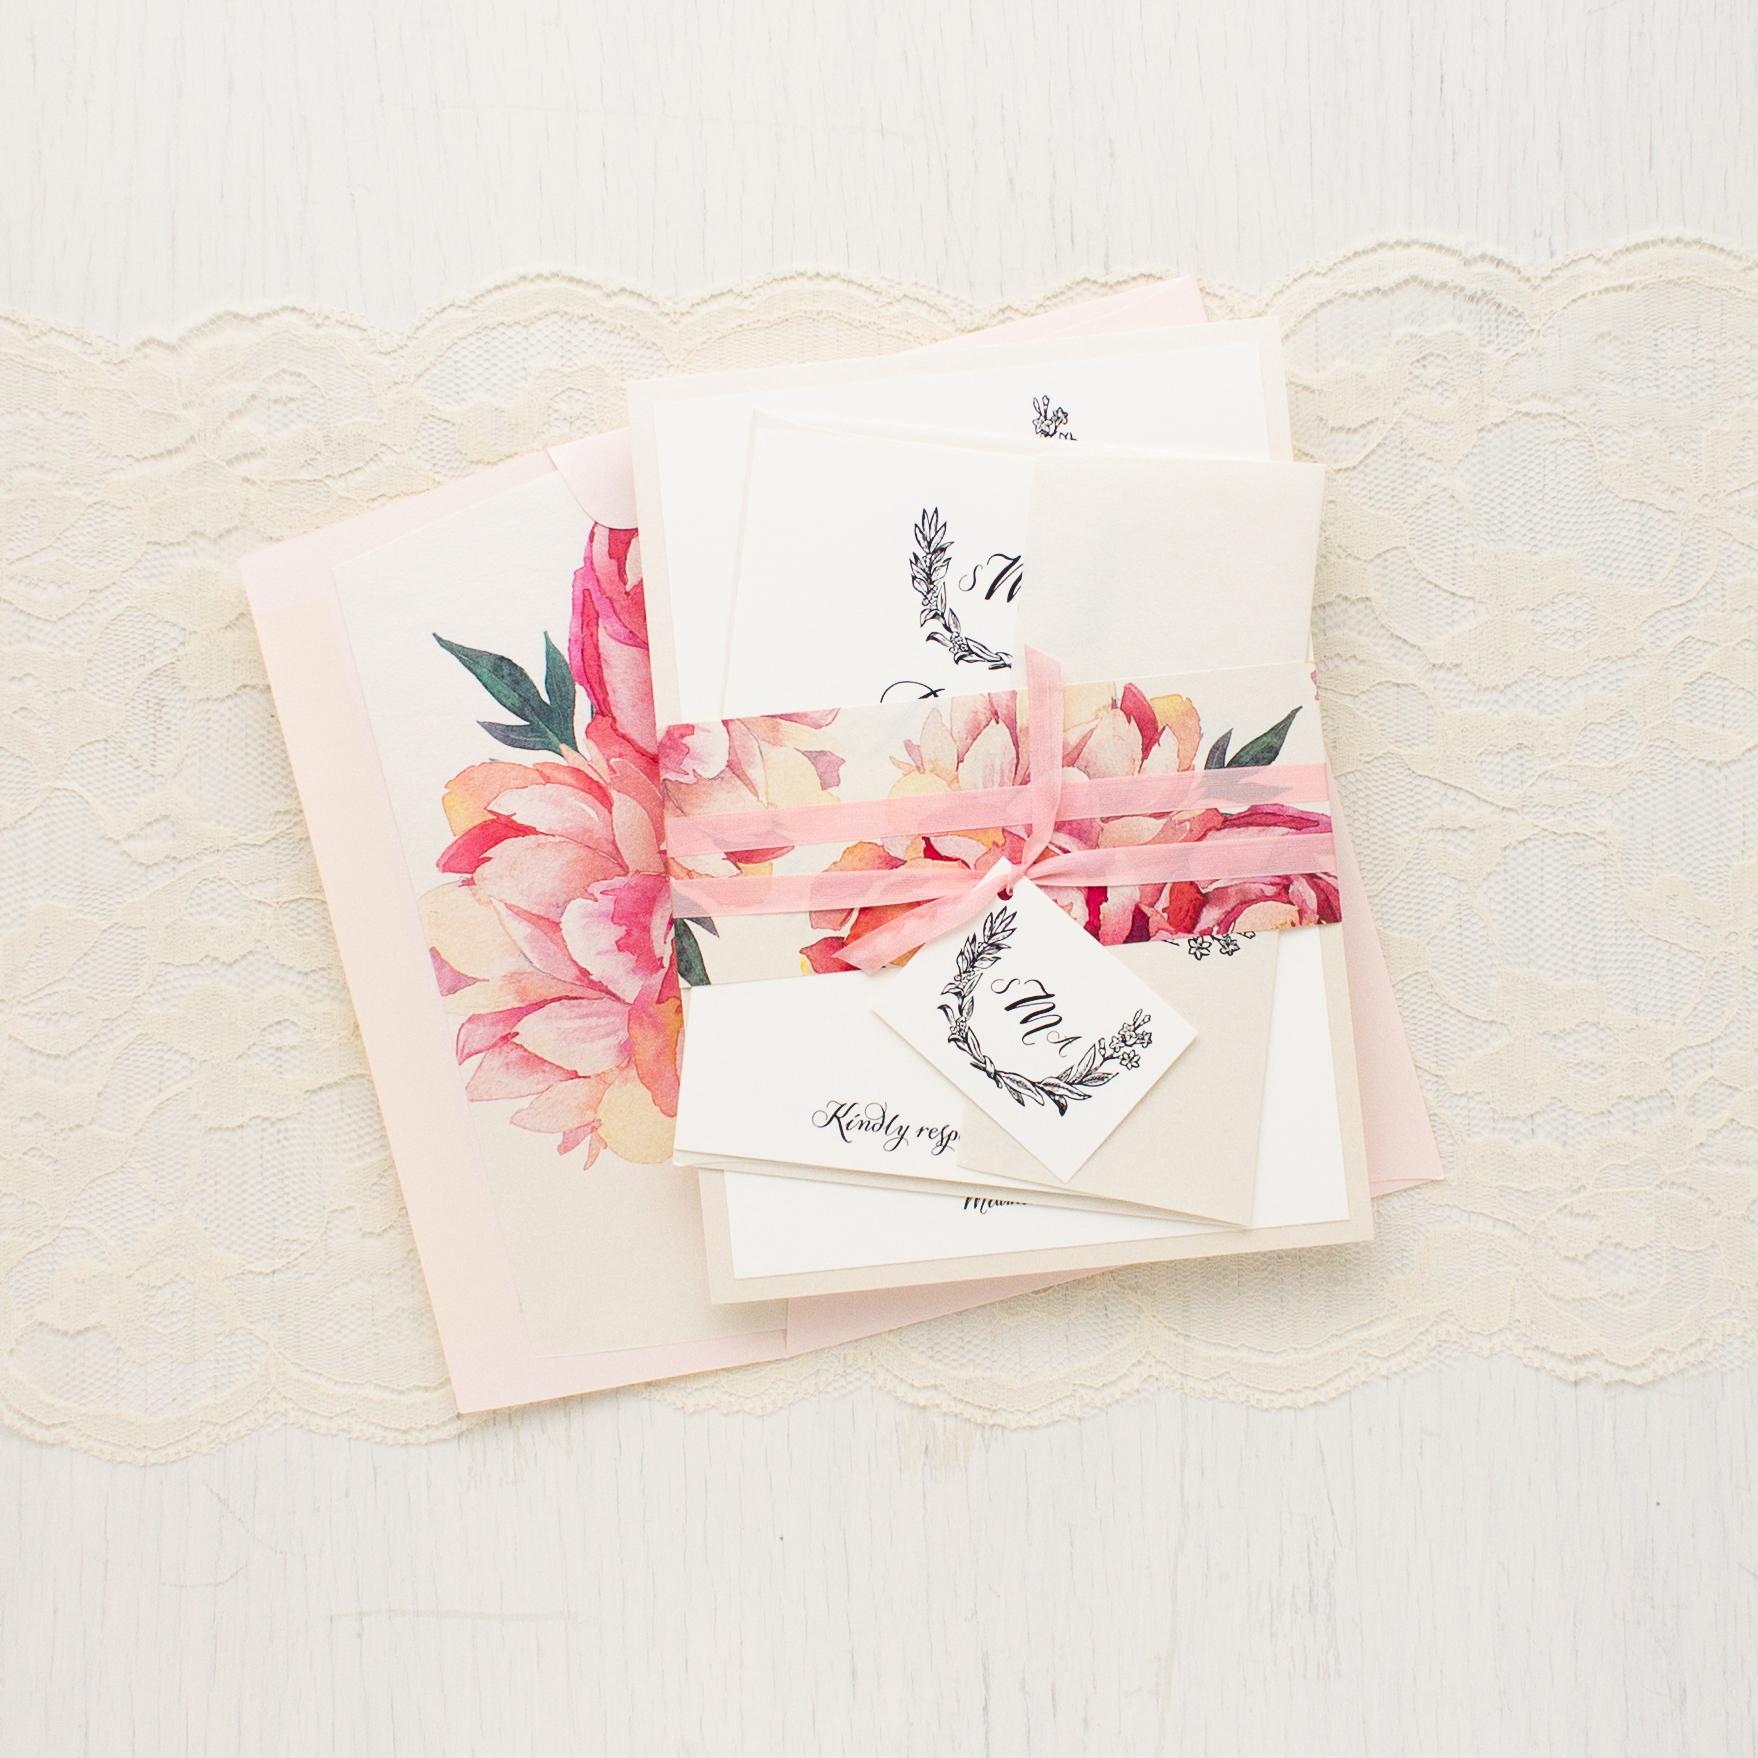 Pink Peonies Wedding Invitations | Beacon Lane